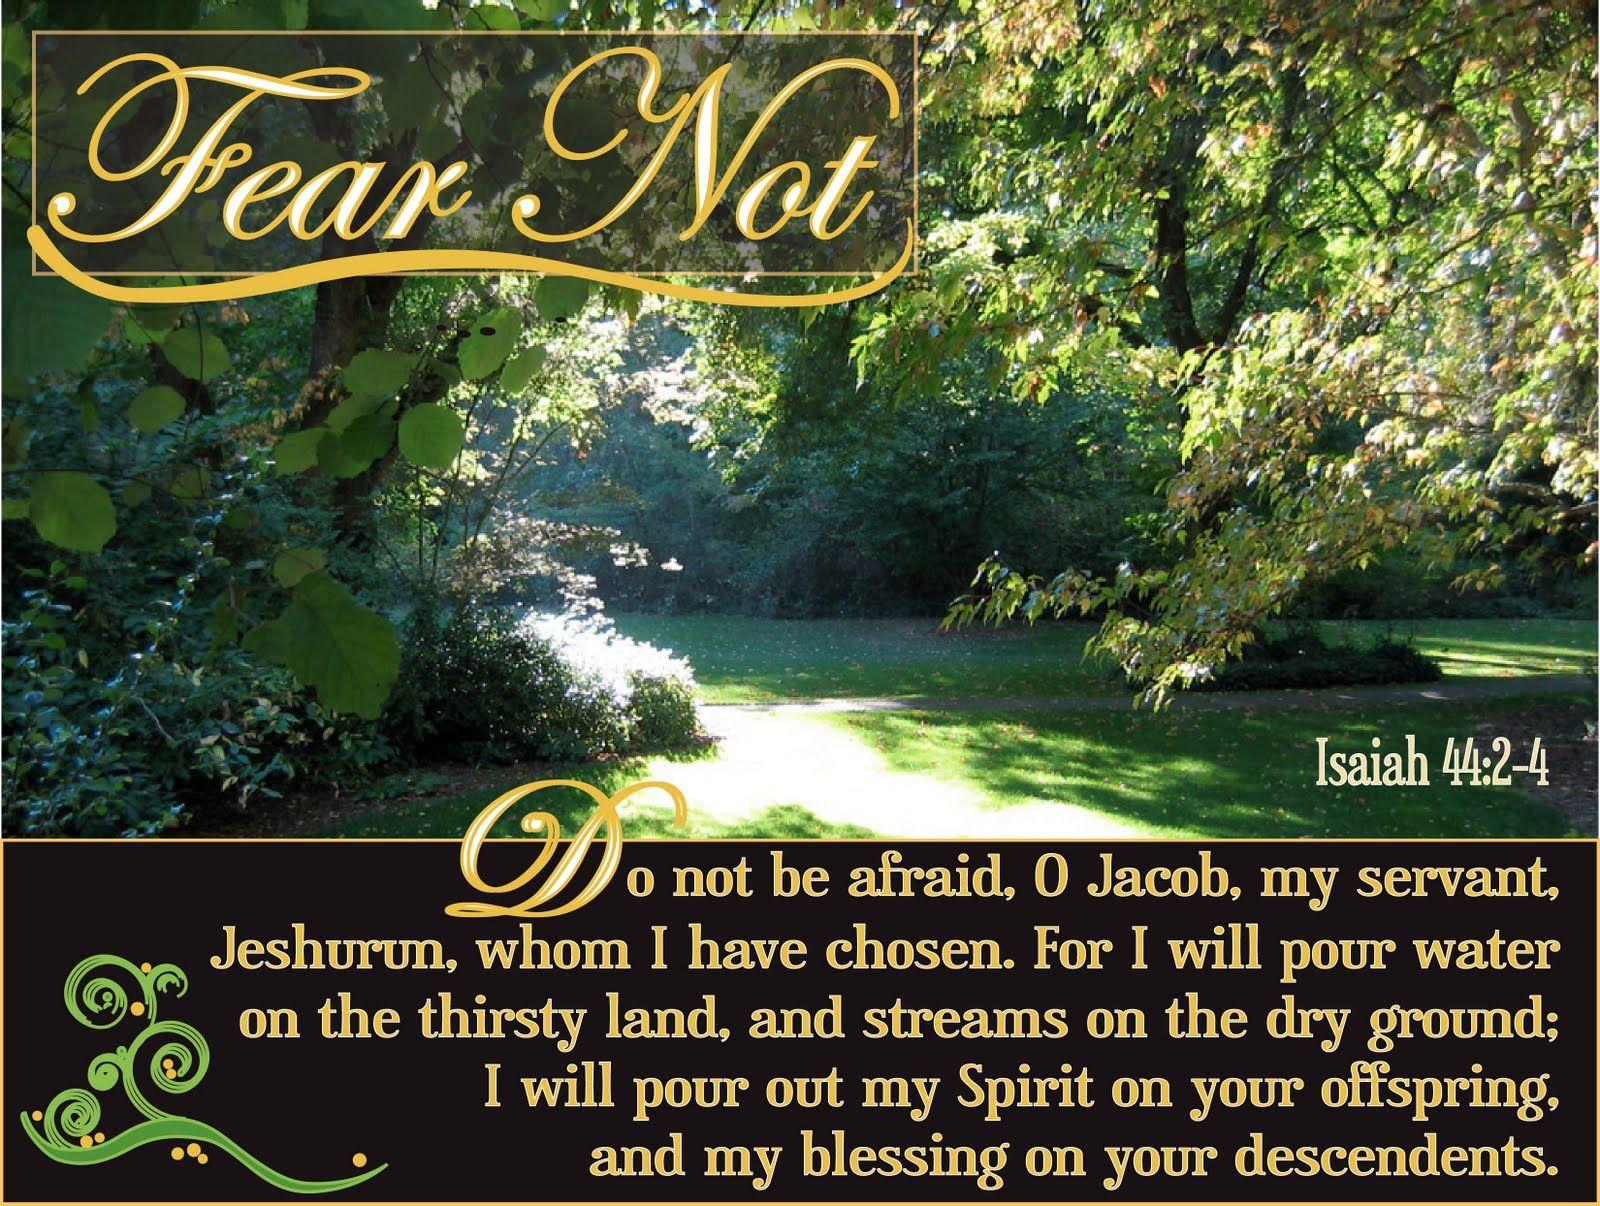 Christian Inspirational Quotes Christian Inspirational Quotes  Cards  Pinterest  Cards